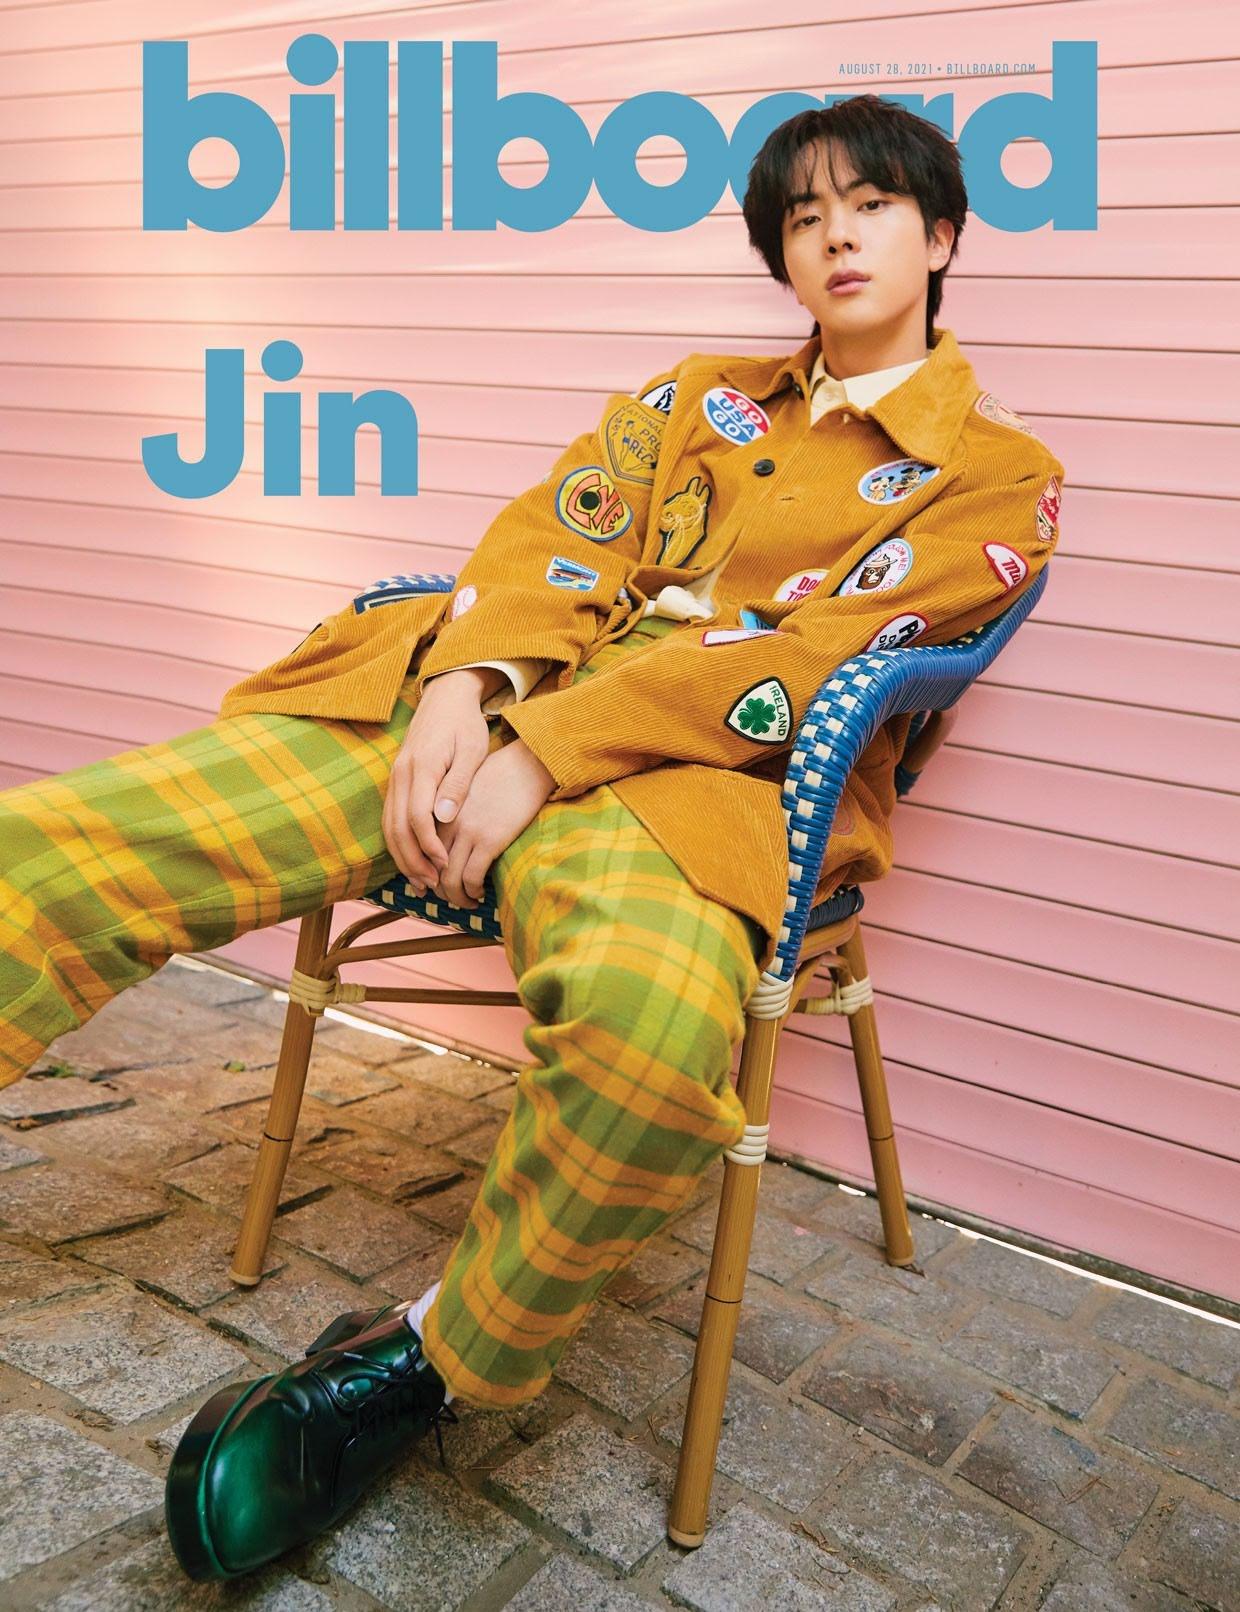 Jin-bb12-cover-bts-billboard-1240-1629975220-compressed